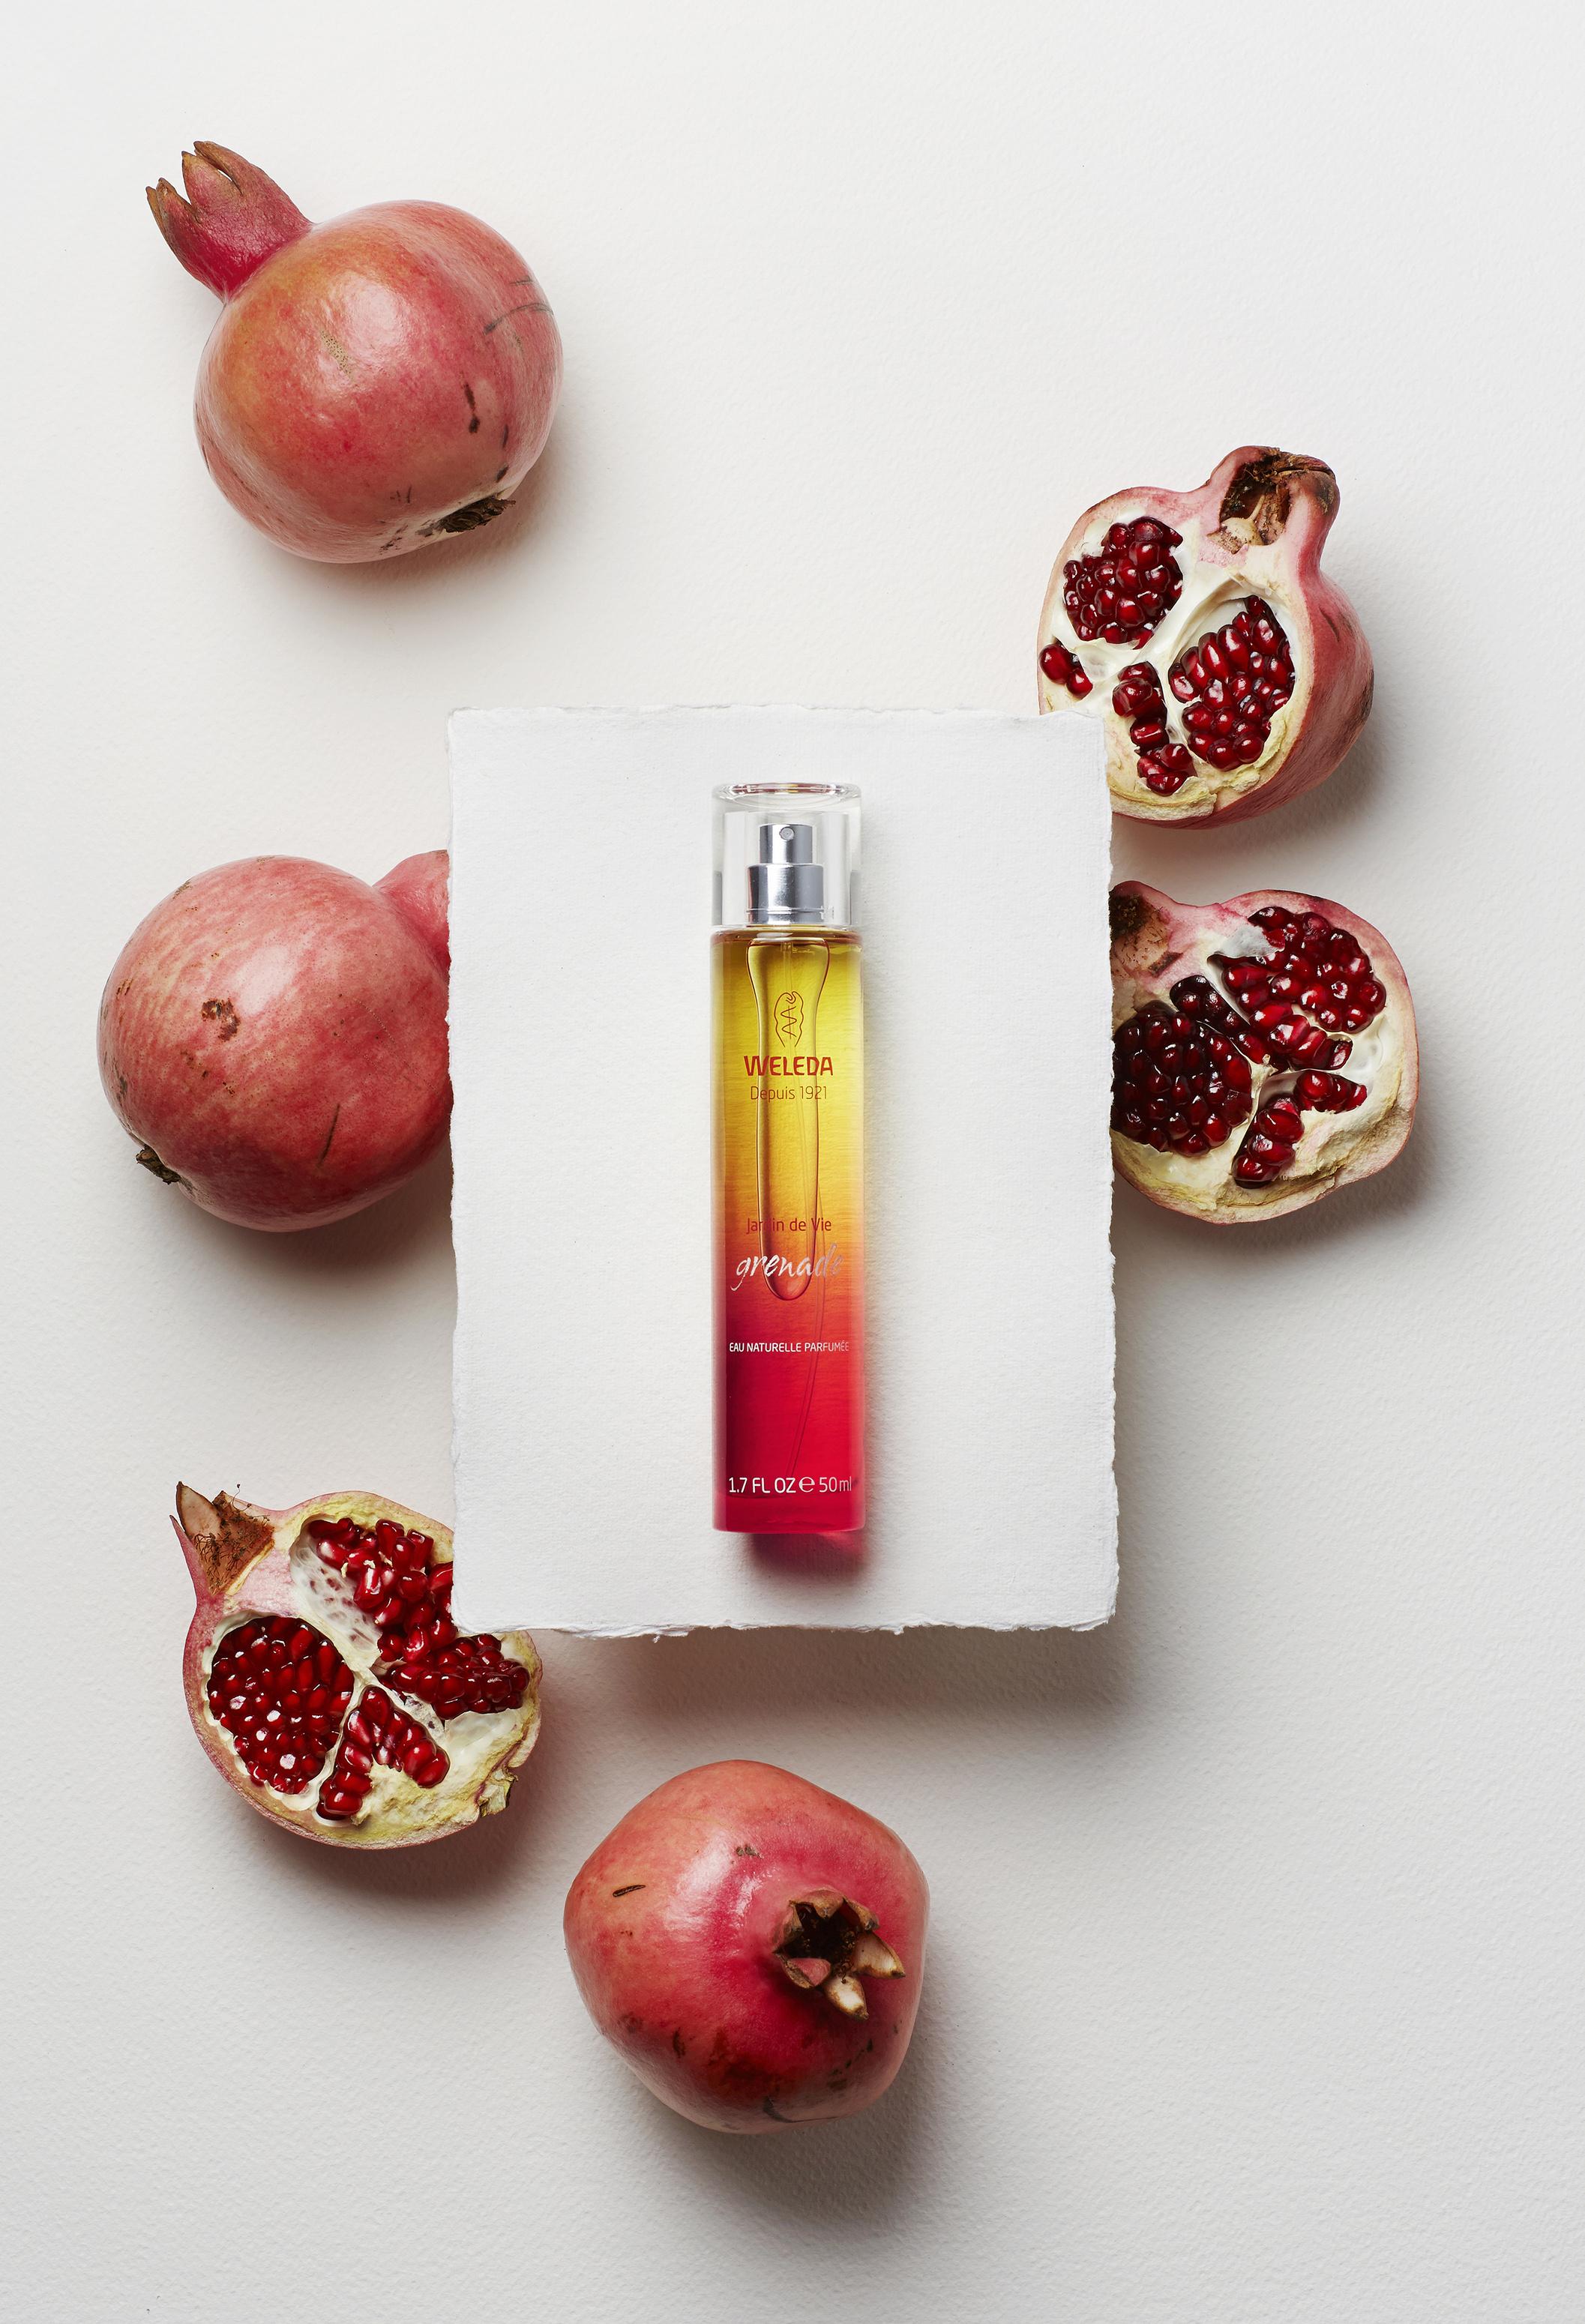 neues von Weleda: Eaux Naturelles Parfumées